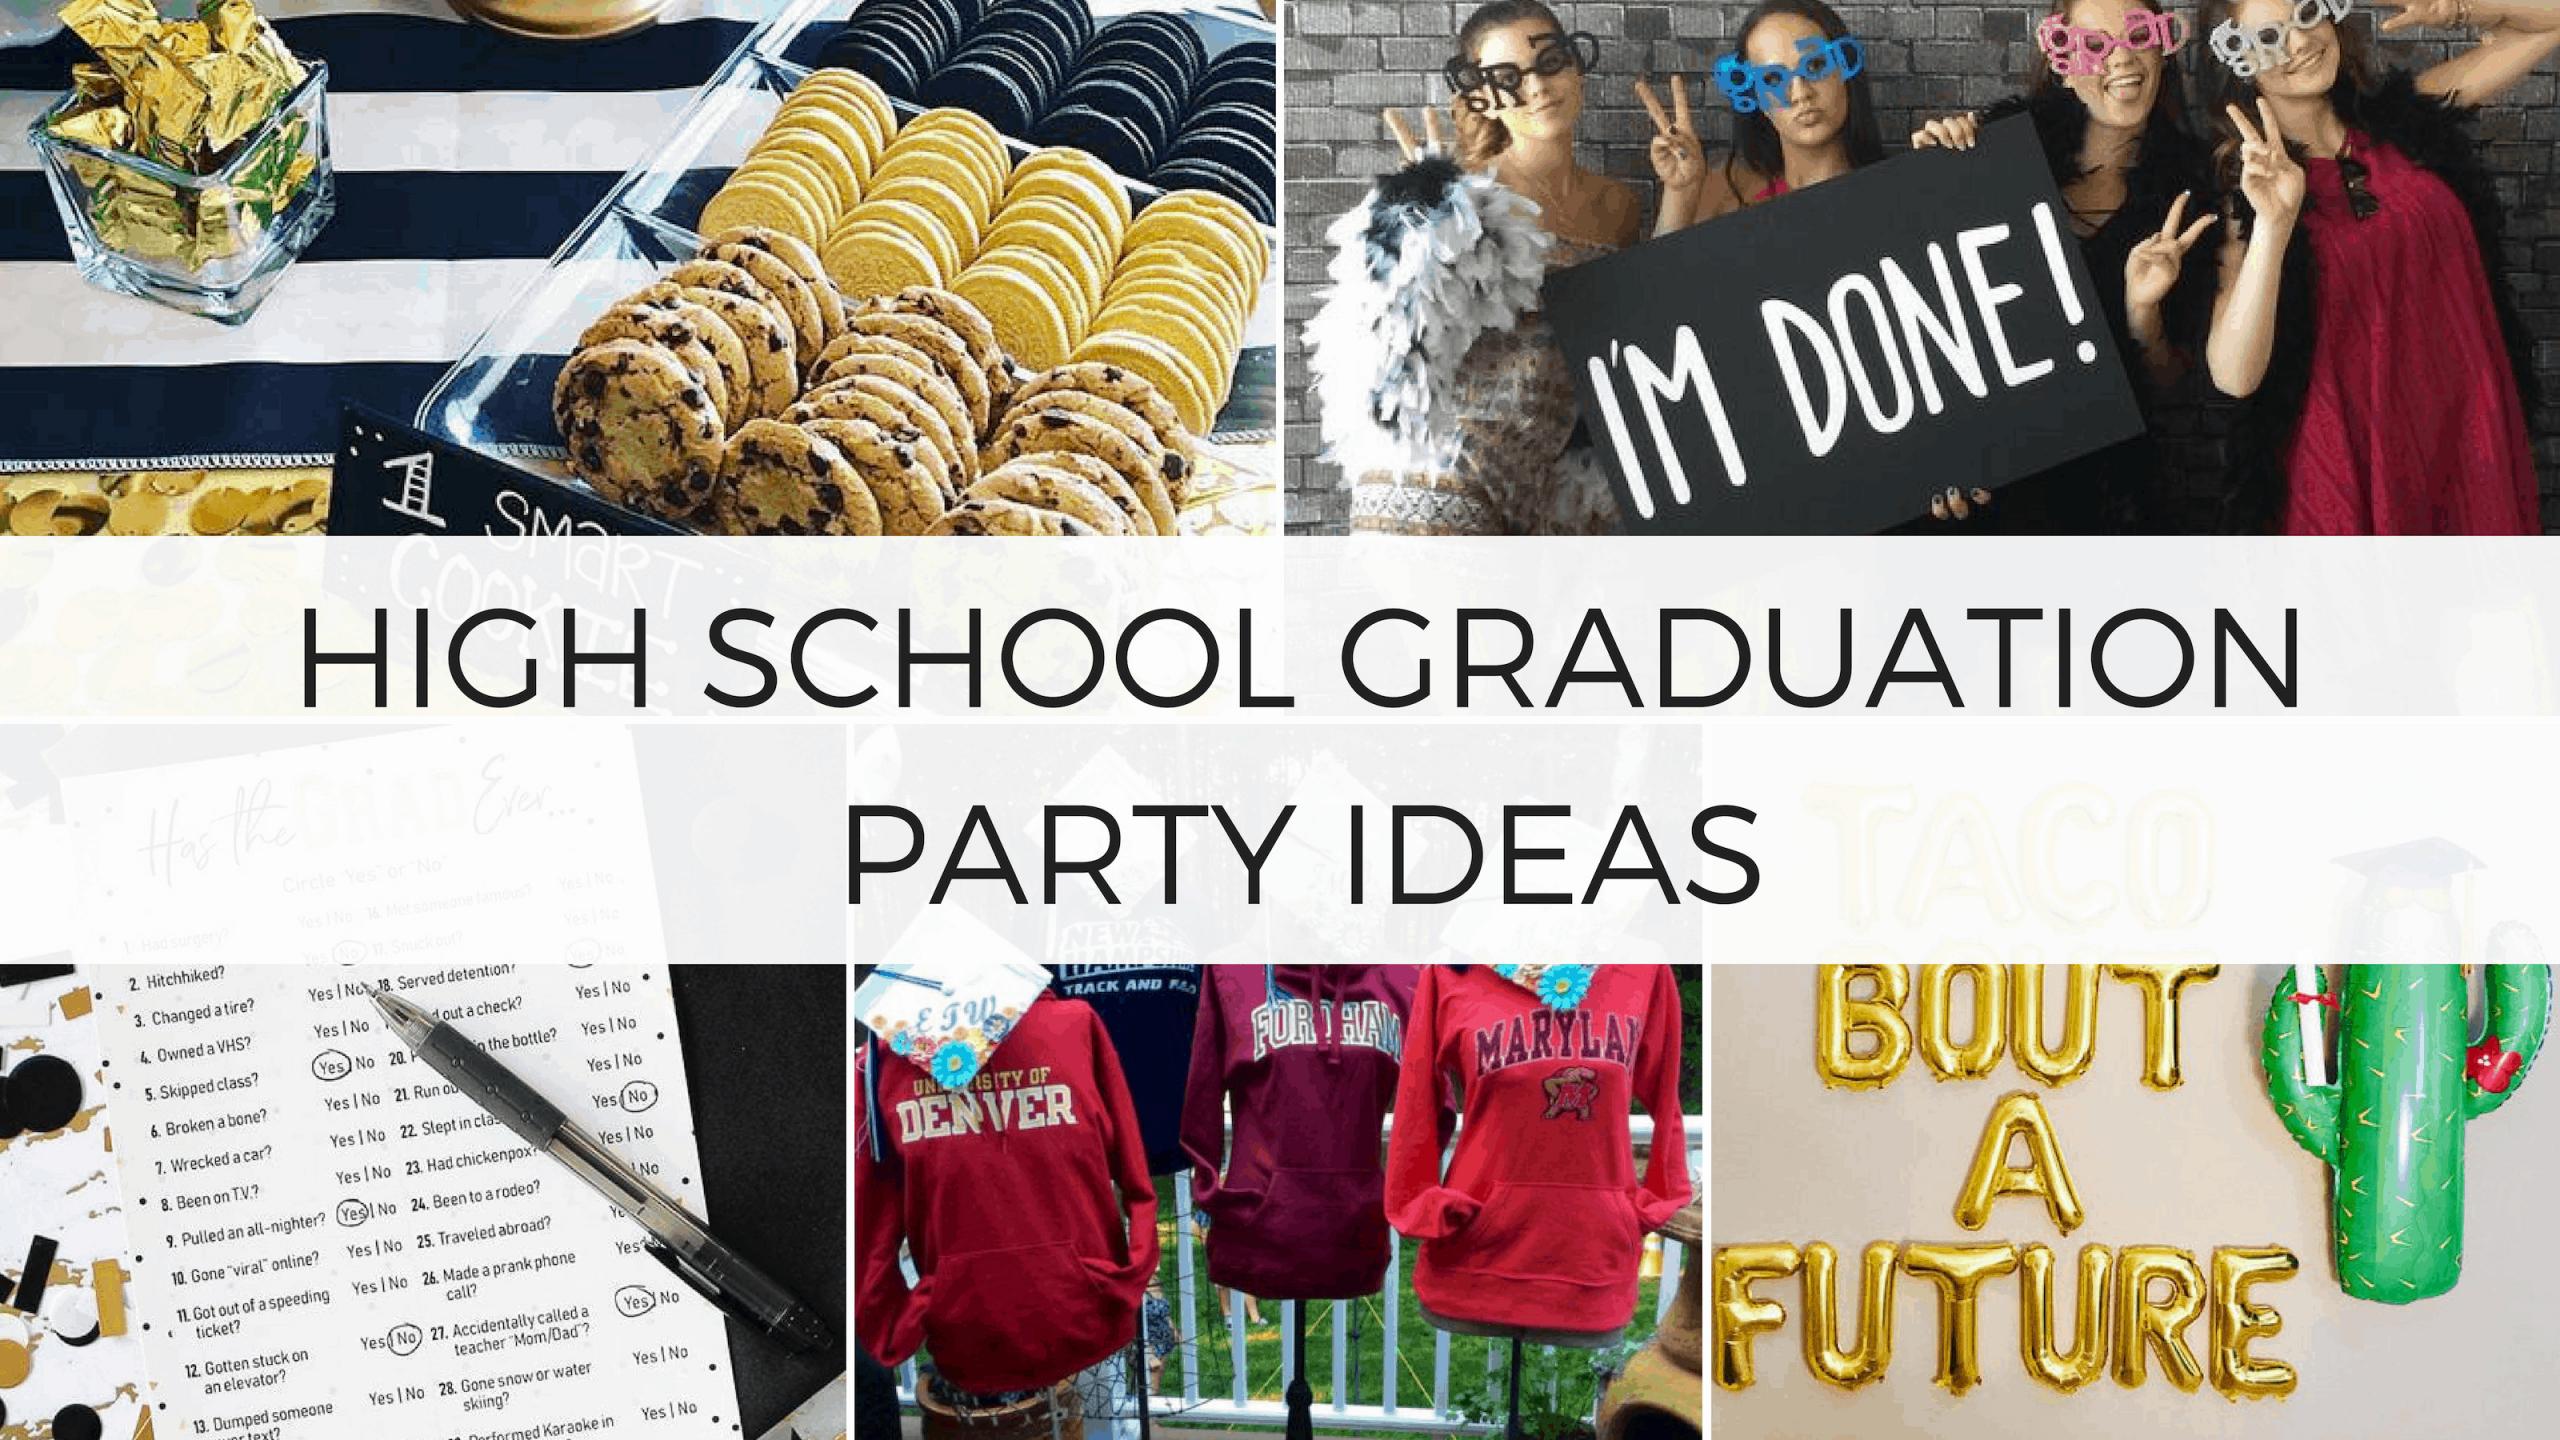 High School Graduation Party Ideas  26 Insanely Creative High School Graduation Party Ideas